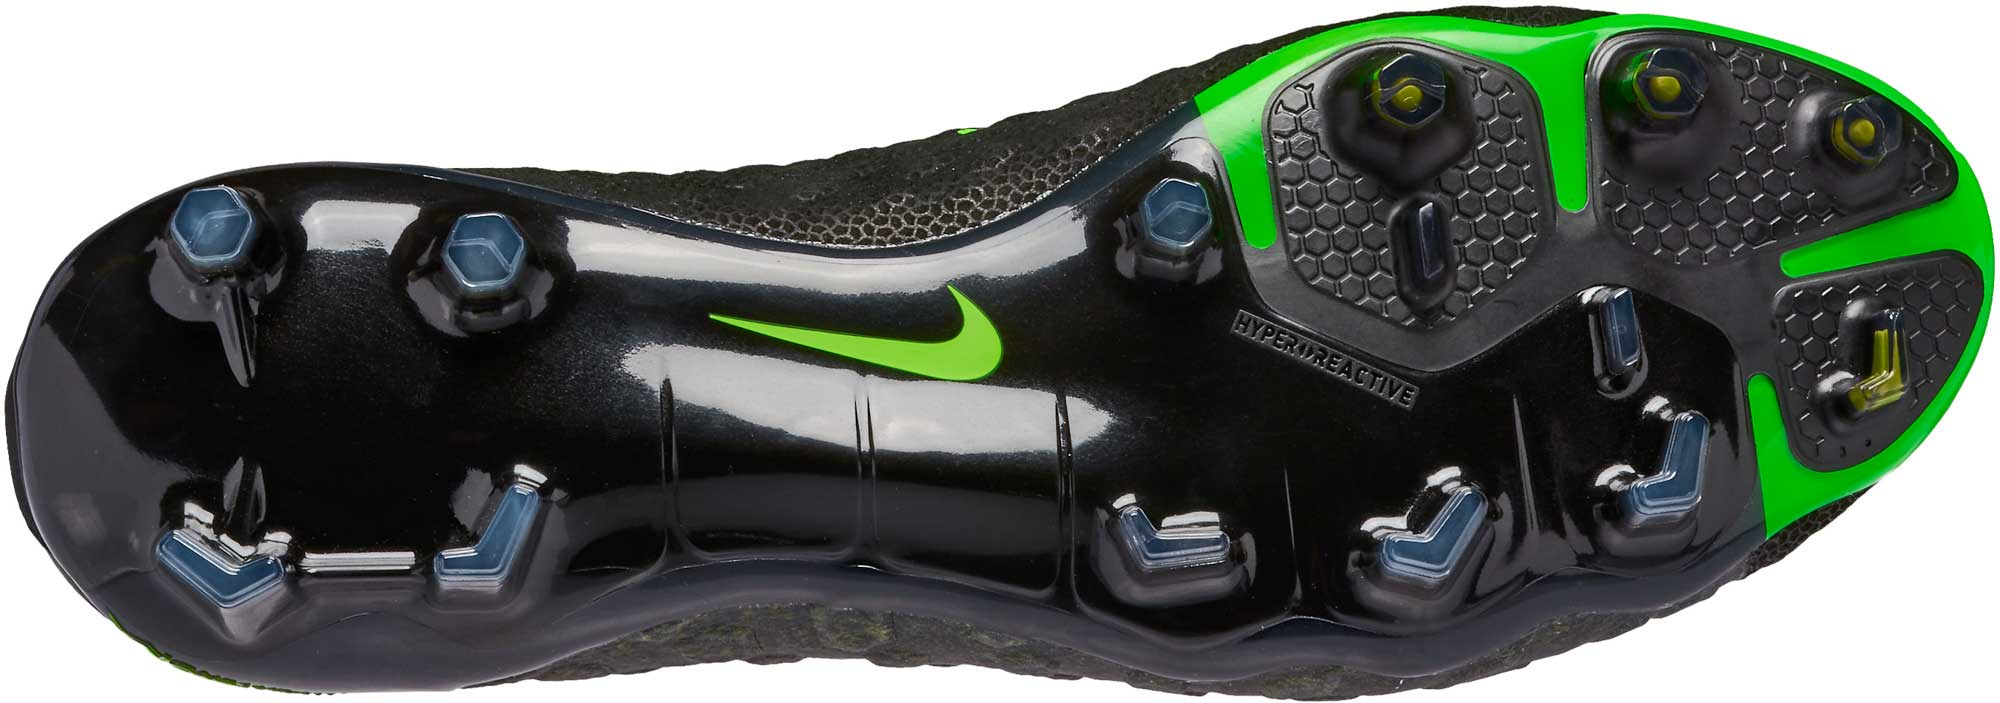 on sale ccc4f b11f3 Nike Hypervenom Phantom III FG Soccer Cleats - Tech Craft ...